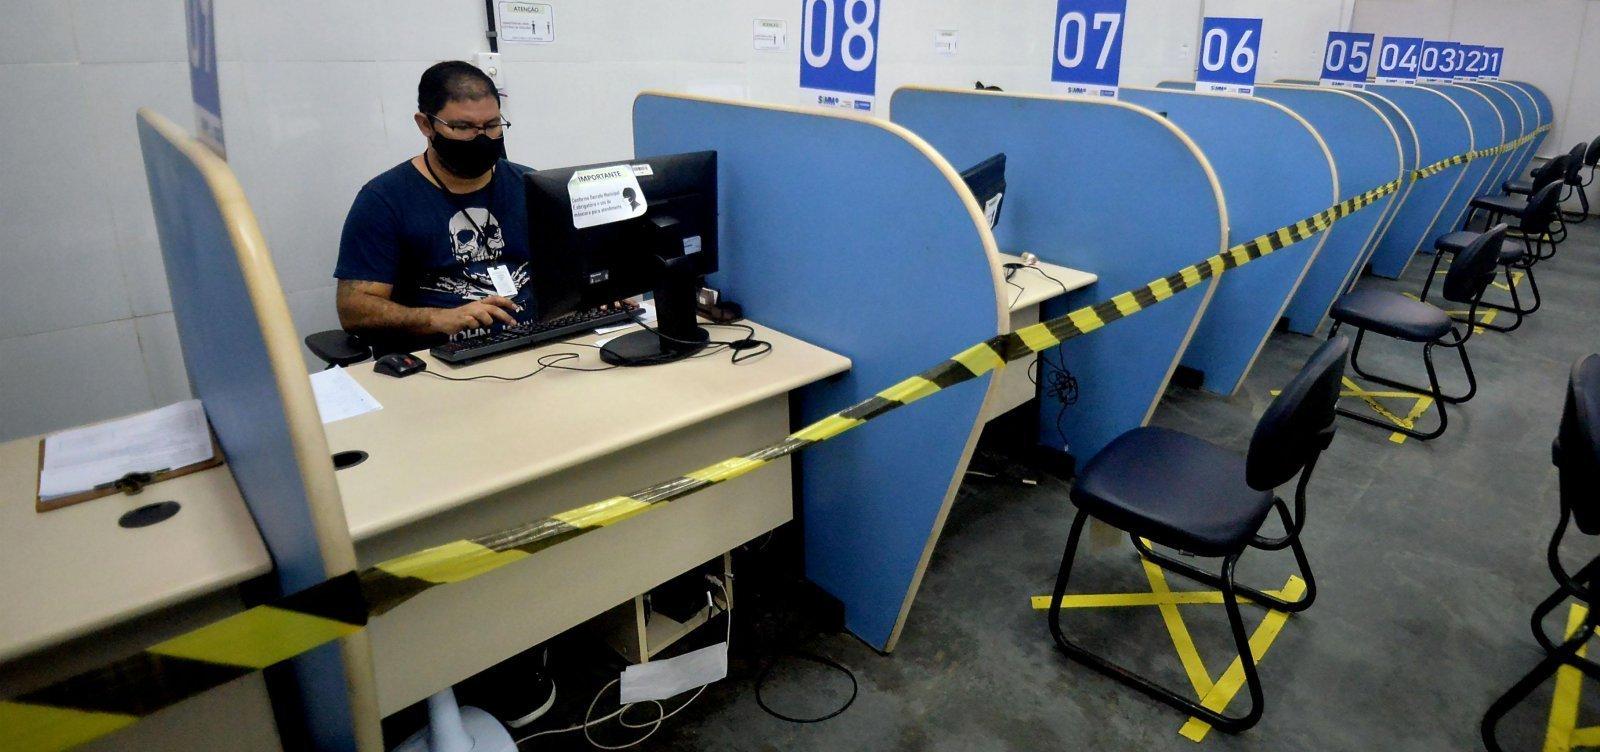 Confira as vagas de emprego oferecidas na Bahia nesta segunda-feira